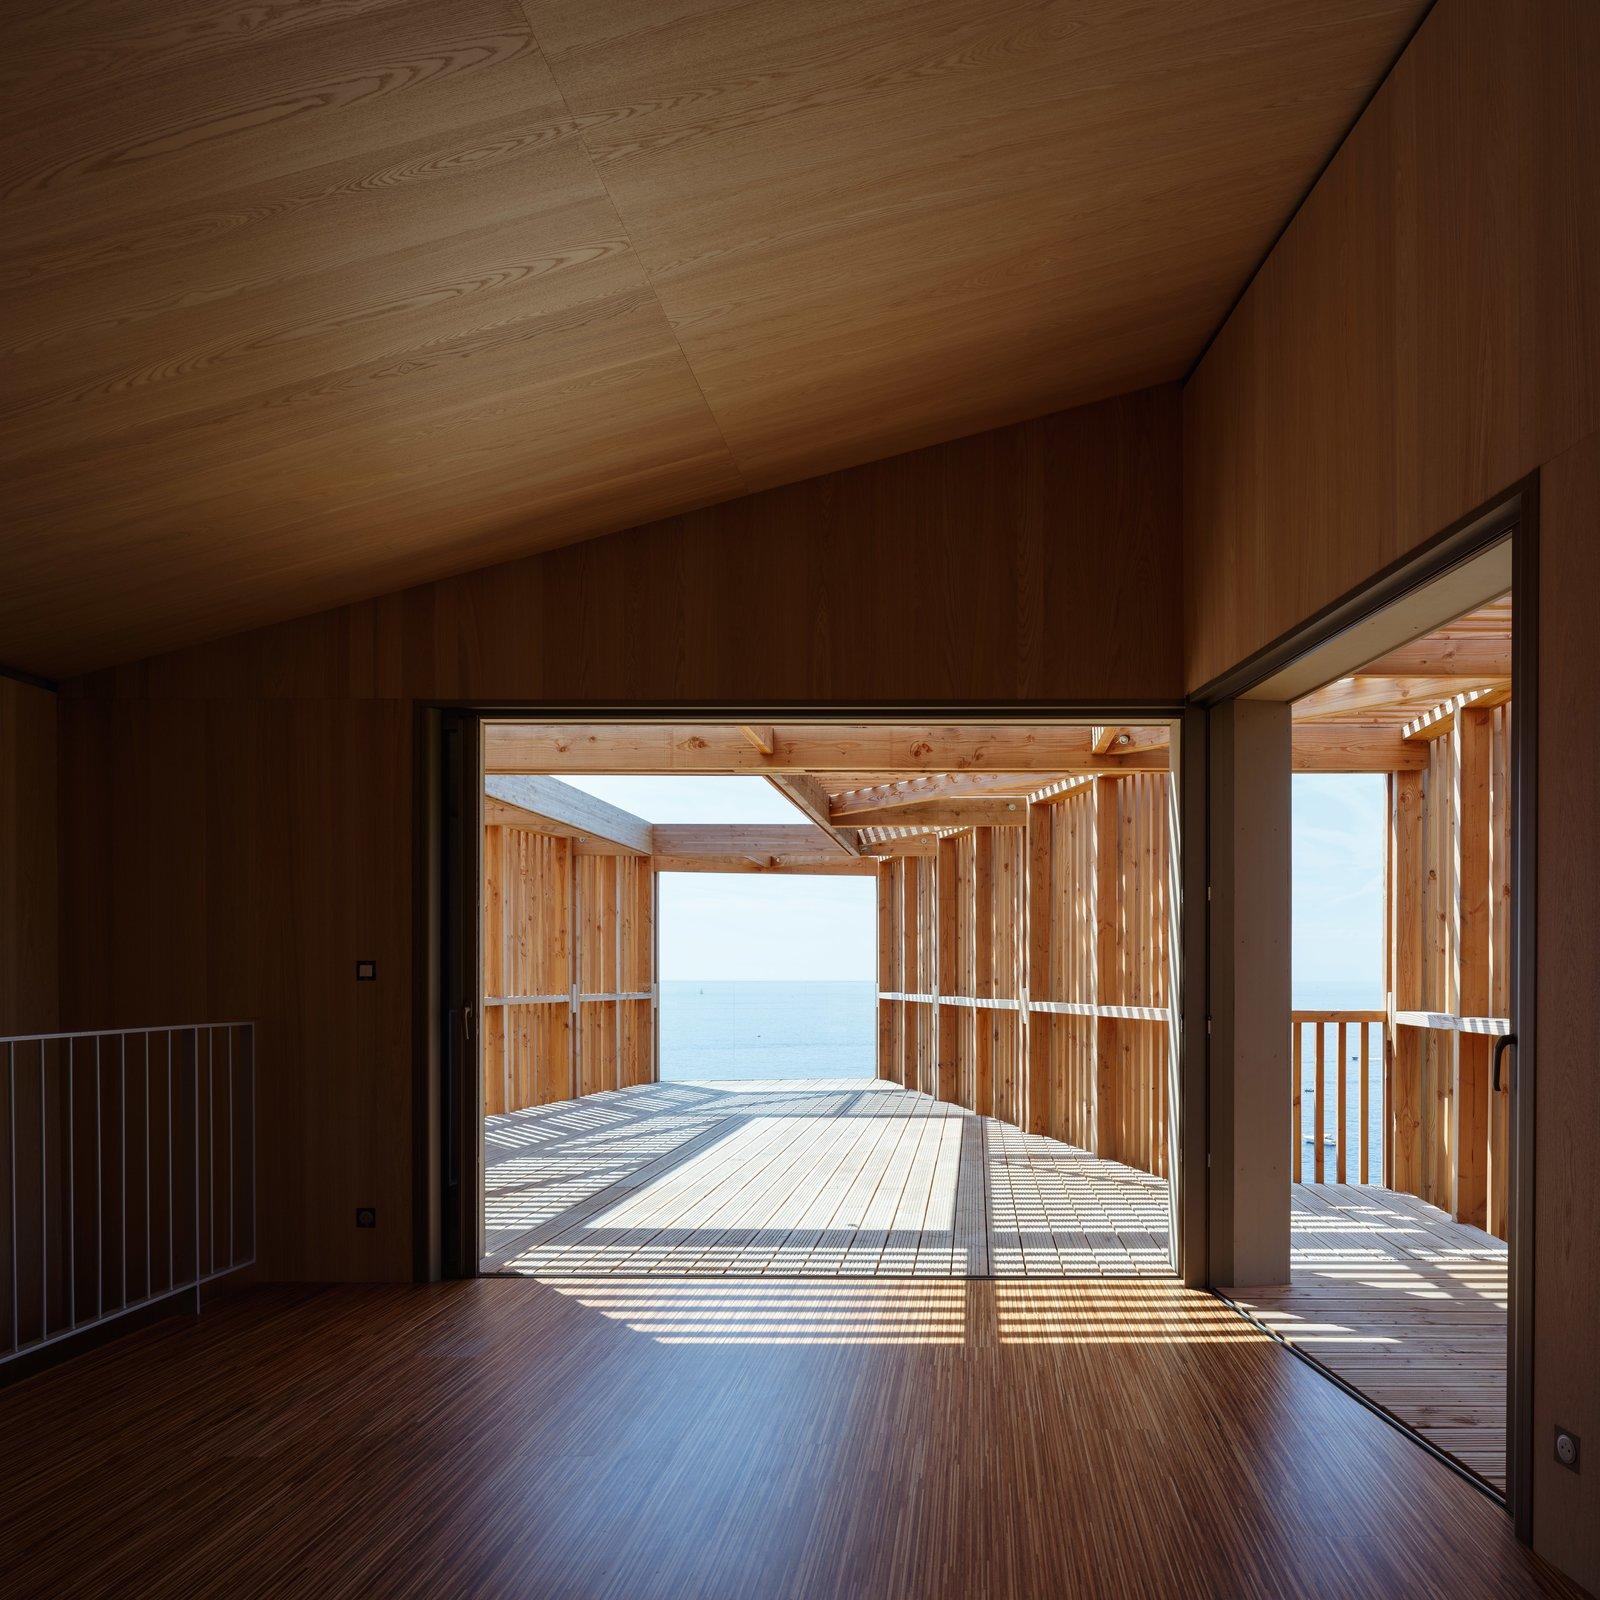 Living Room and Medium Hardwood Floor  The KGET in Marseille